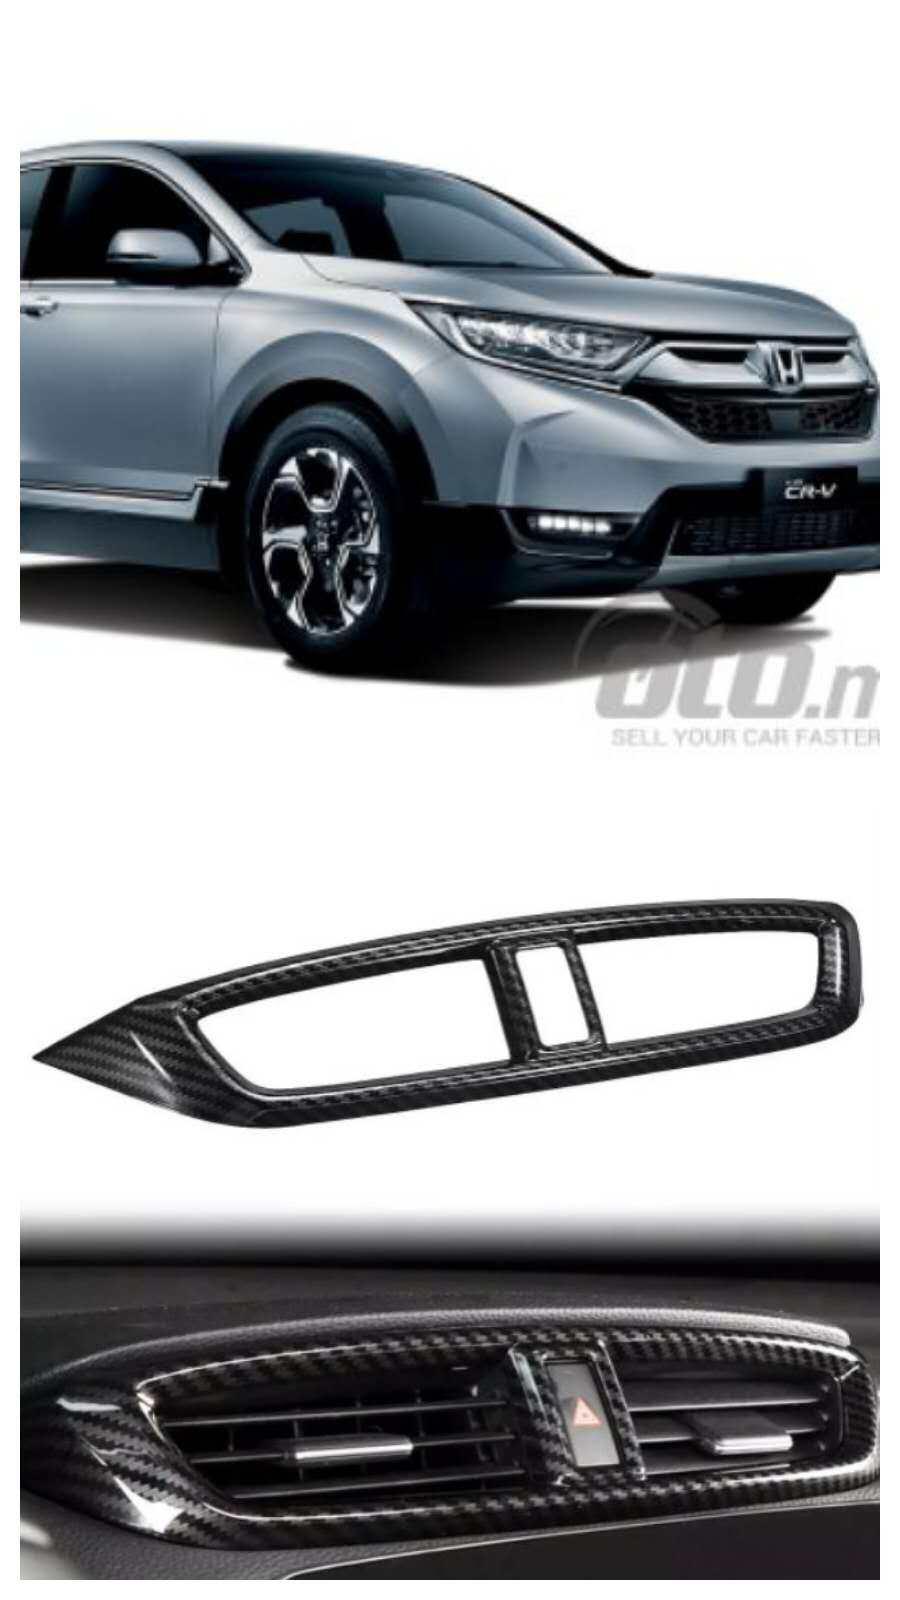 Honda CRV 2017 - 2019 Aircon Vent Cover (Malaysia Version)